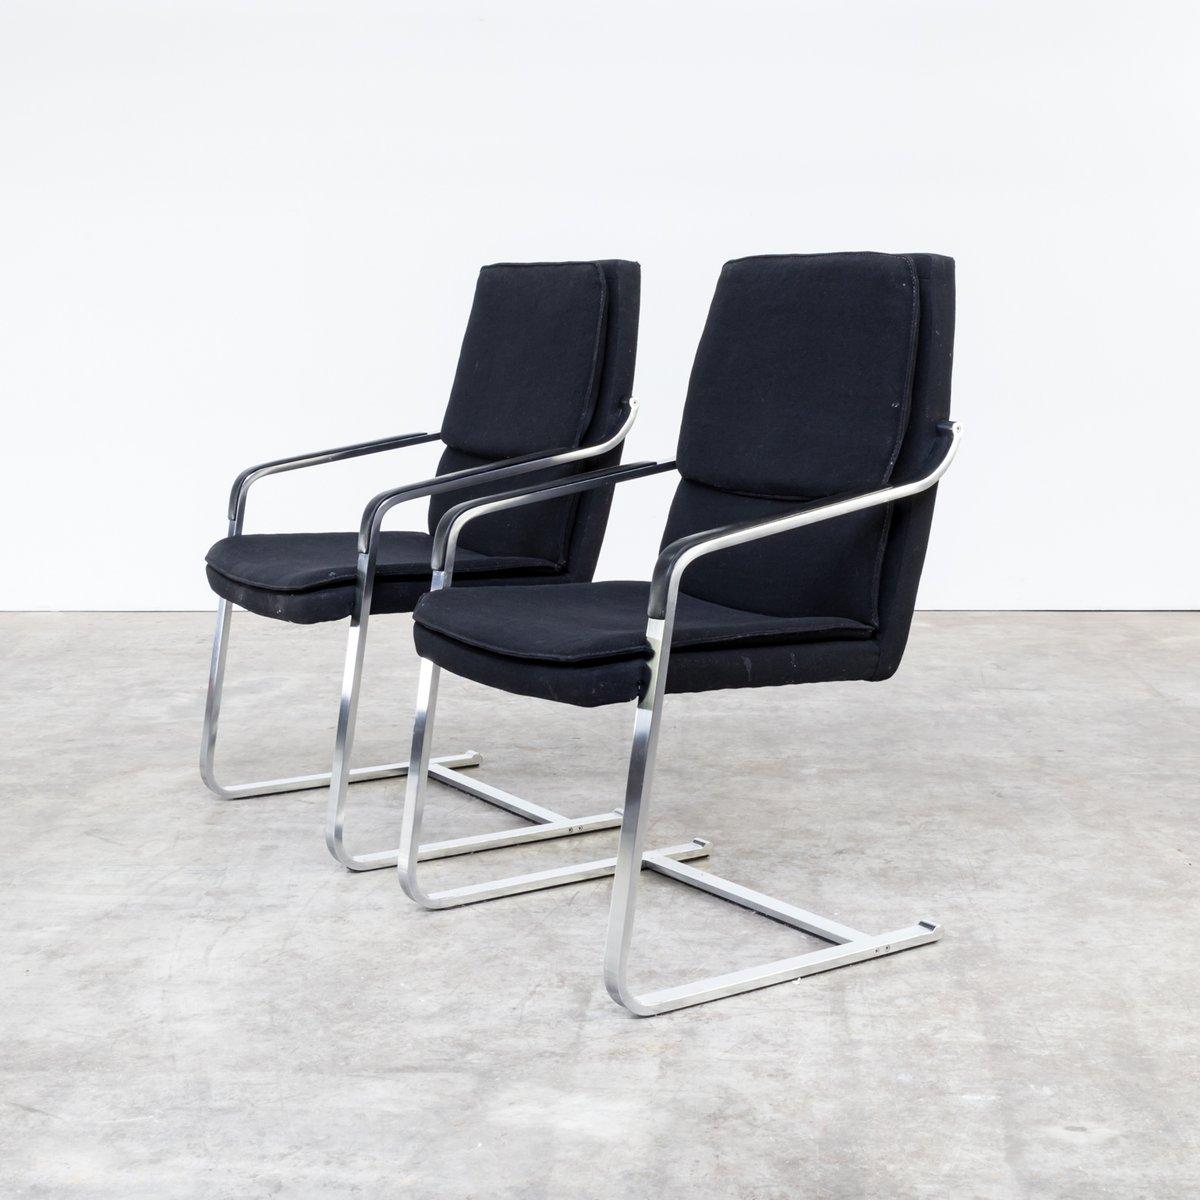 vintage st hle aus chrom schwarzem stoff von walter. Black Bedroom Furniture Sets. Home Design Ideas